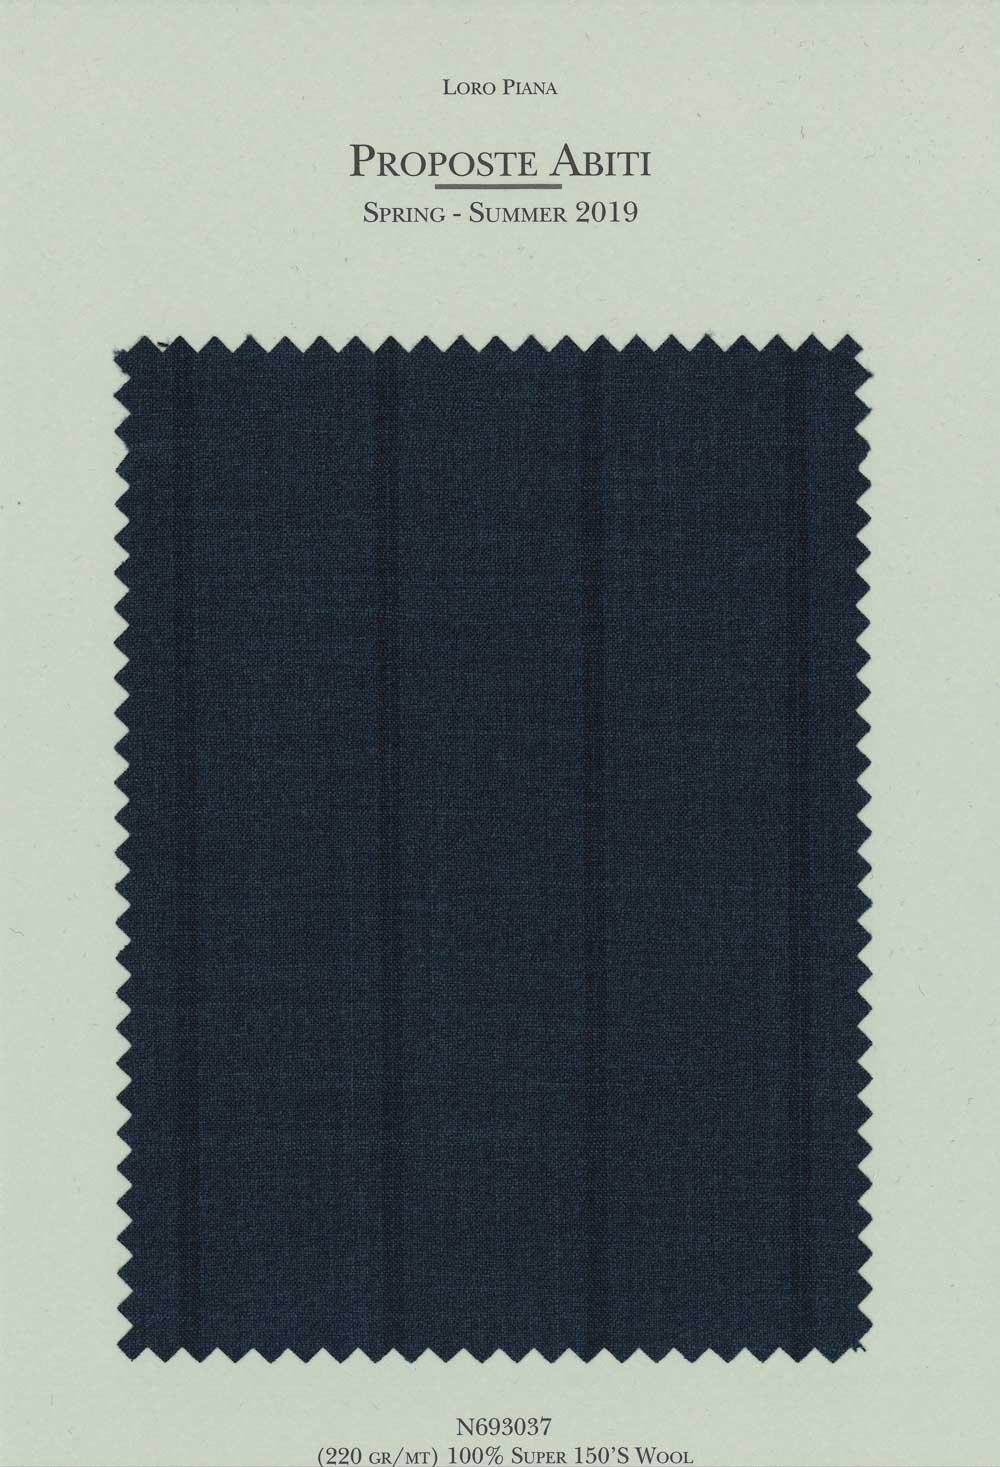 N693037